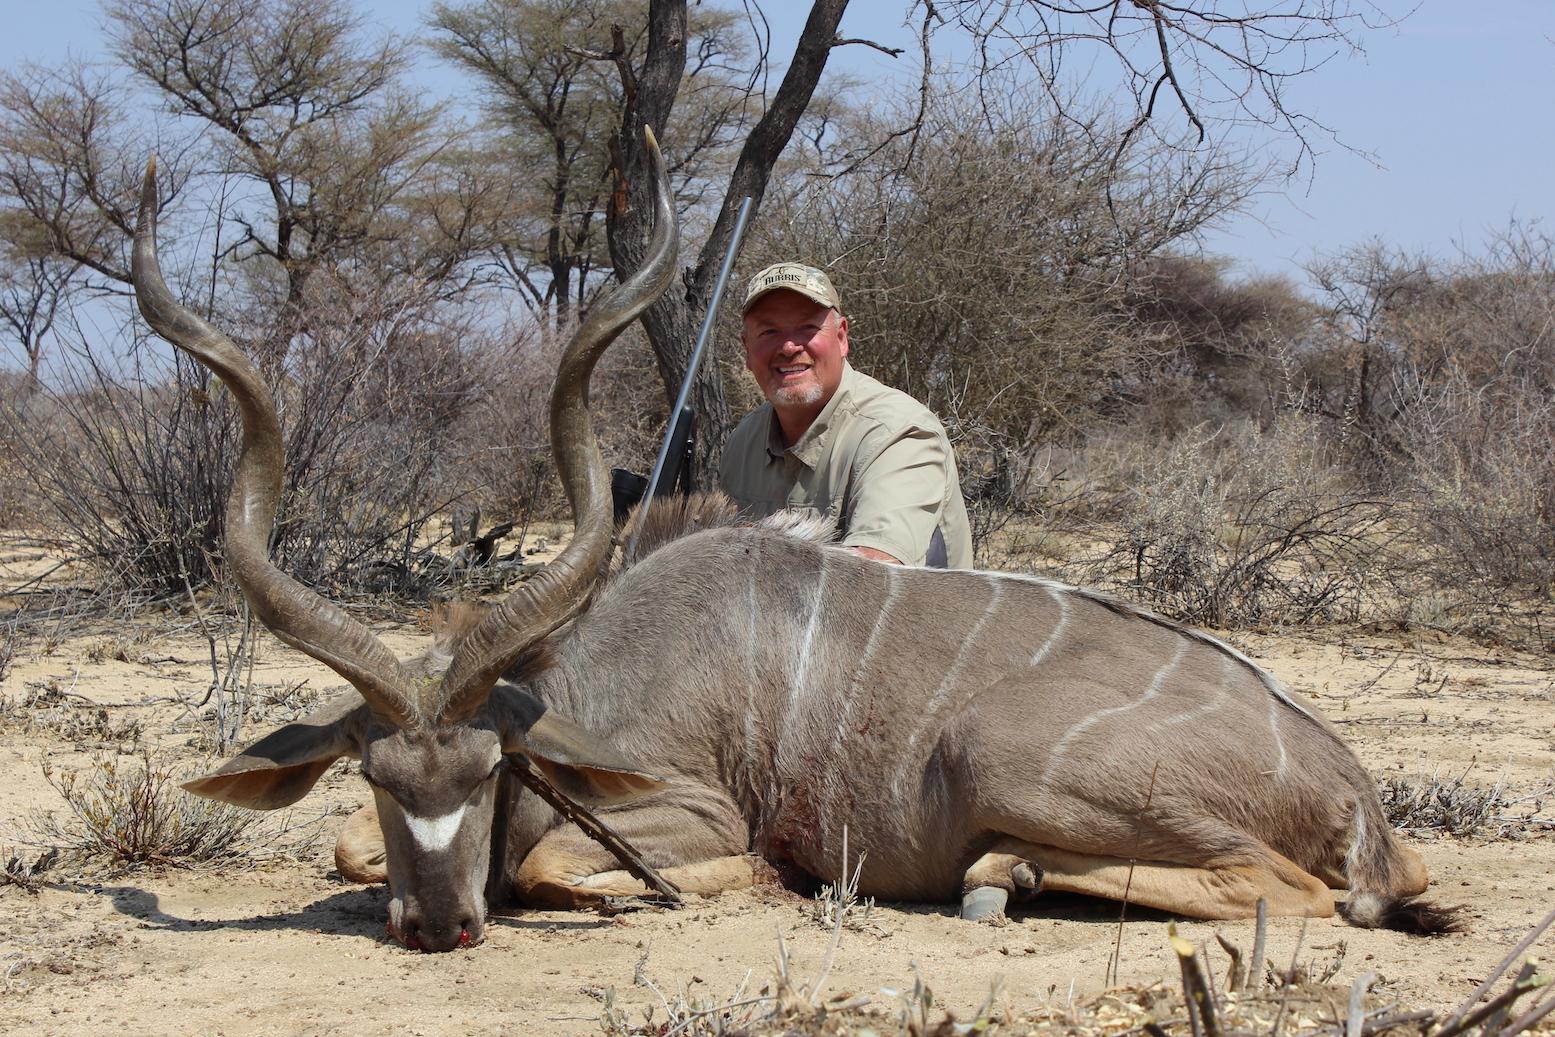 Roy Steele - USA Namibia Trophy Hunting